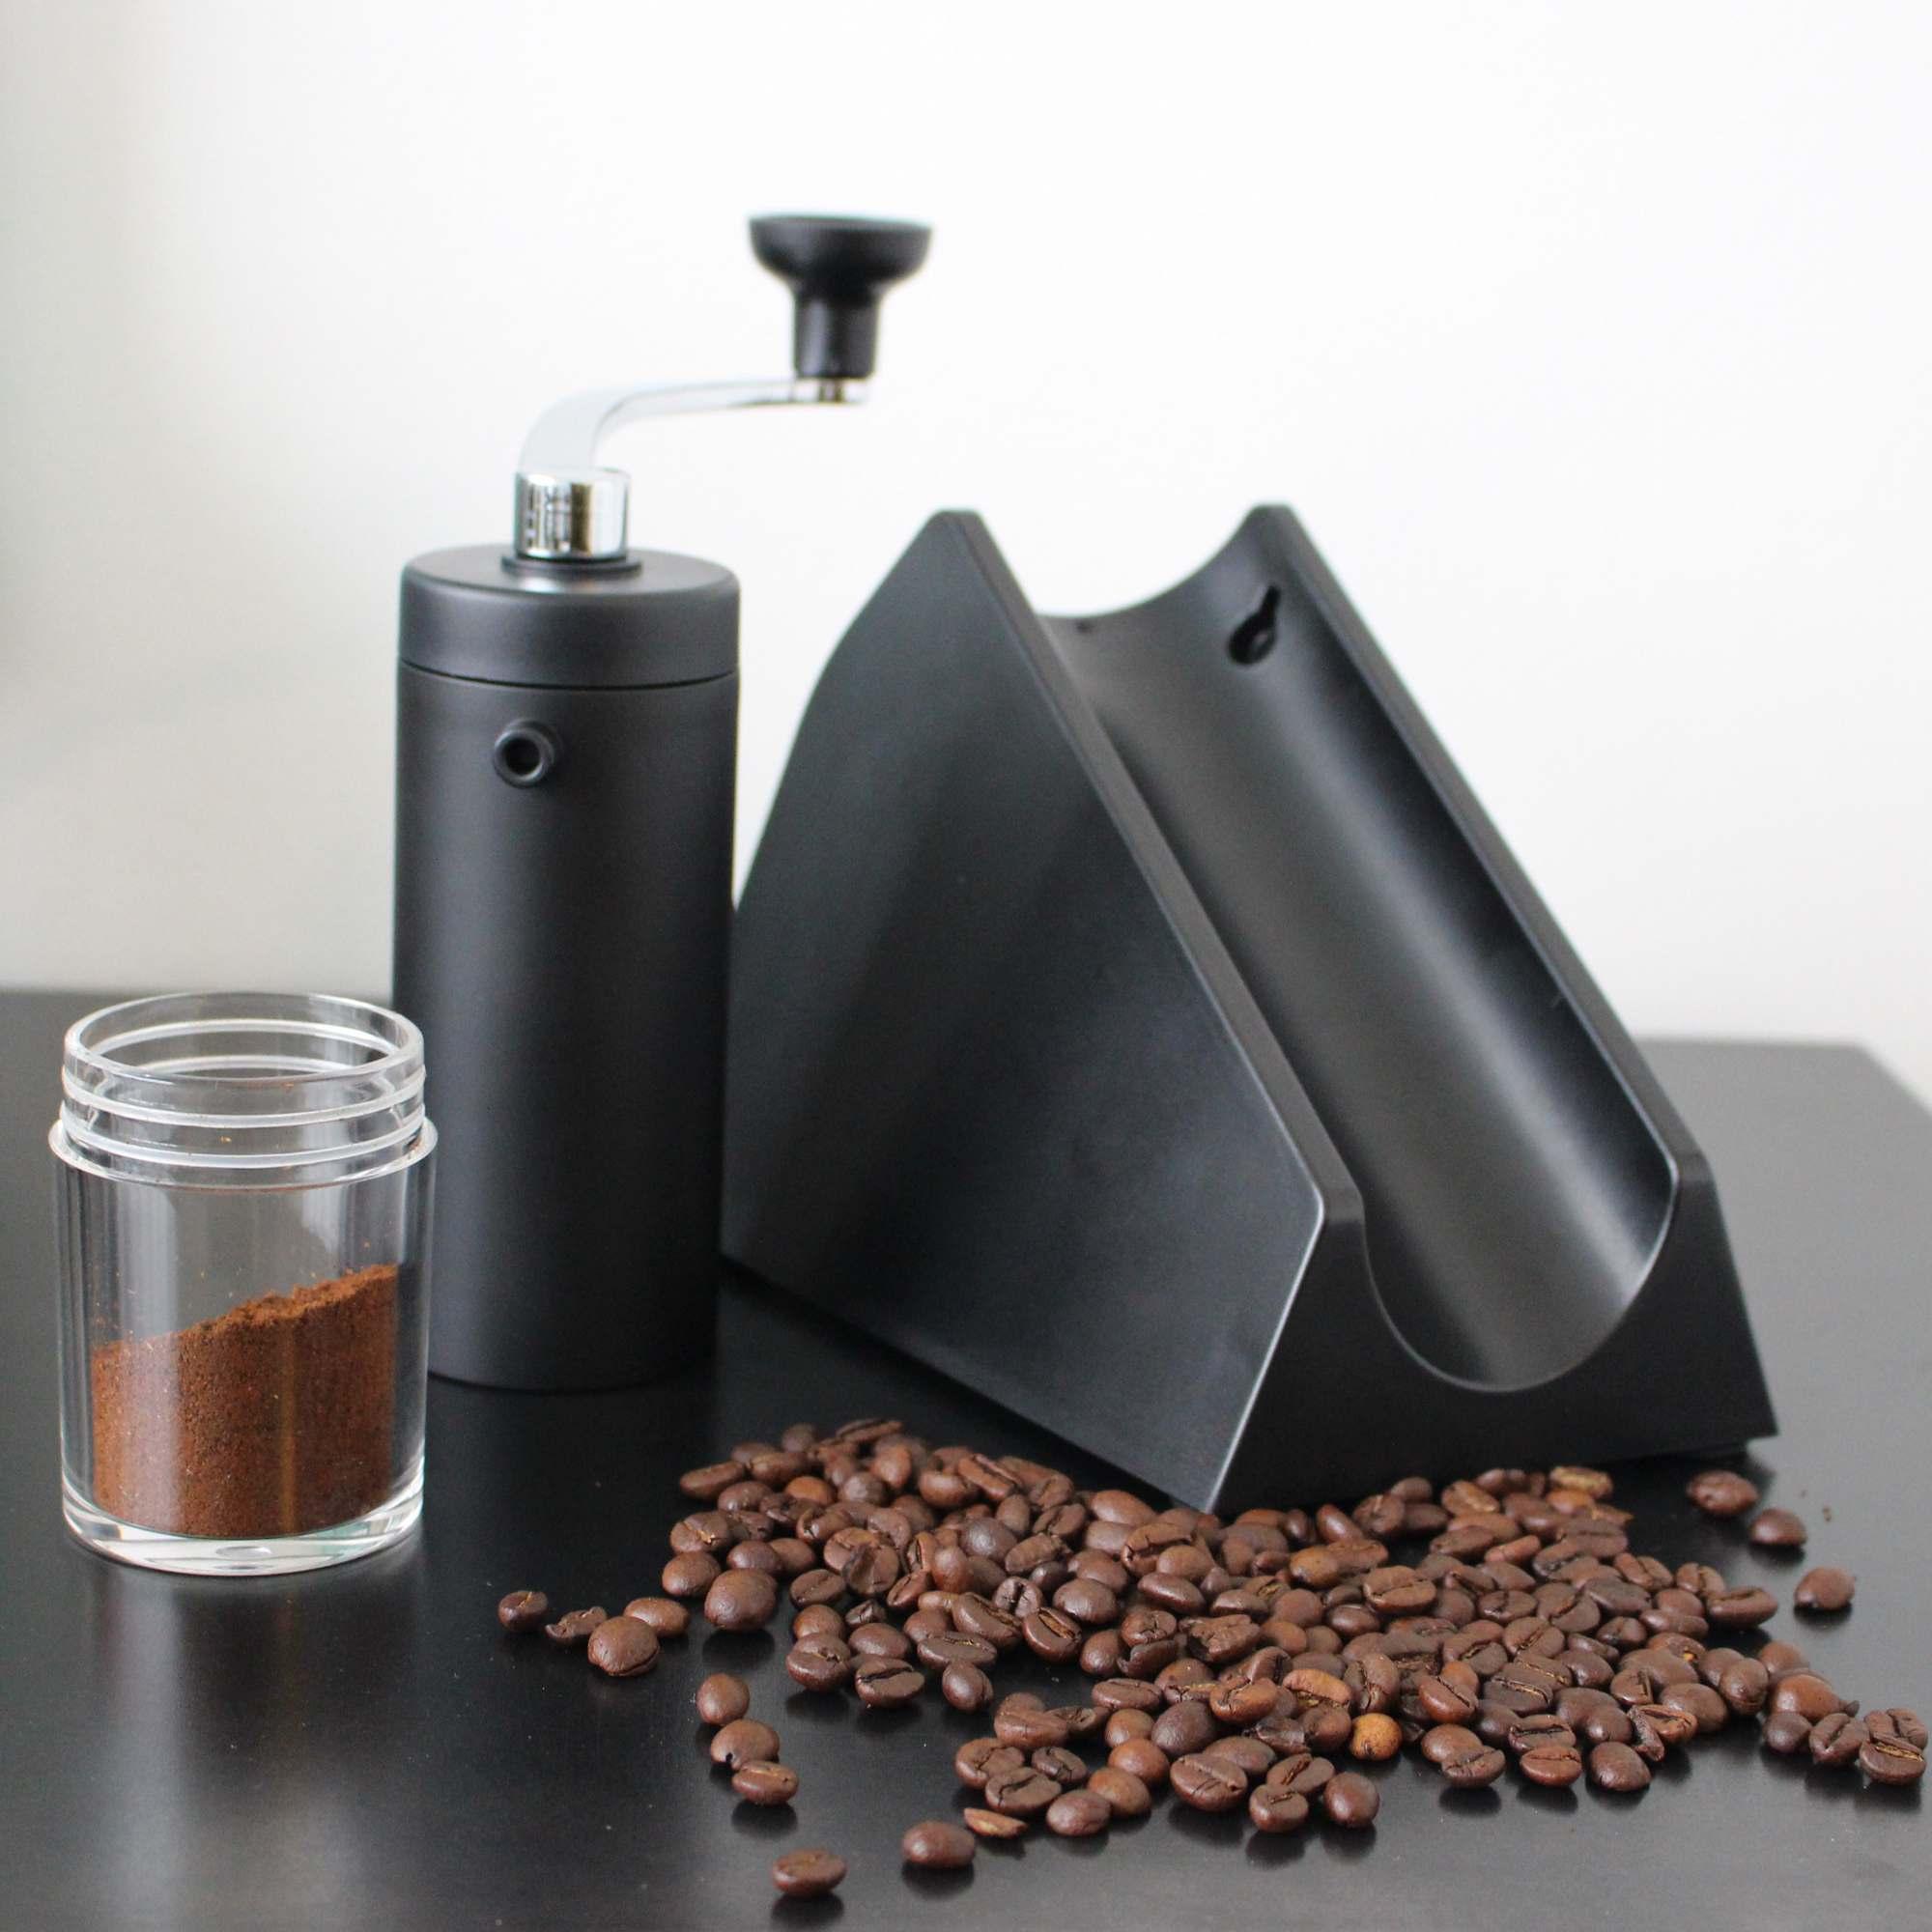 CrushGrind Brazil Coffee Grinder